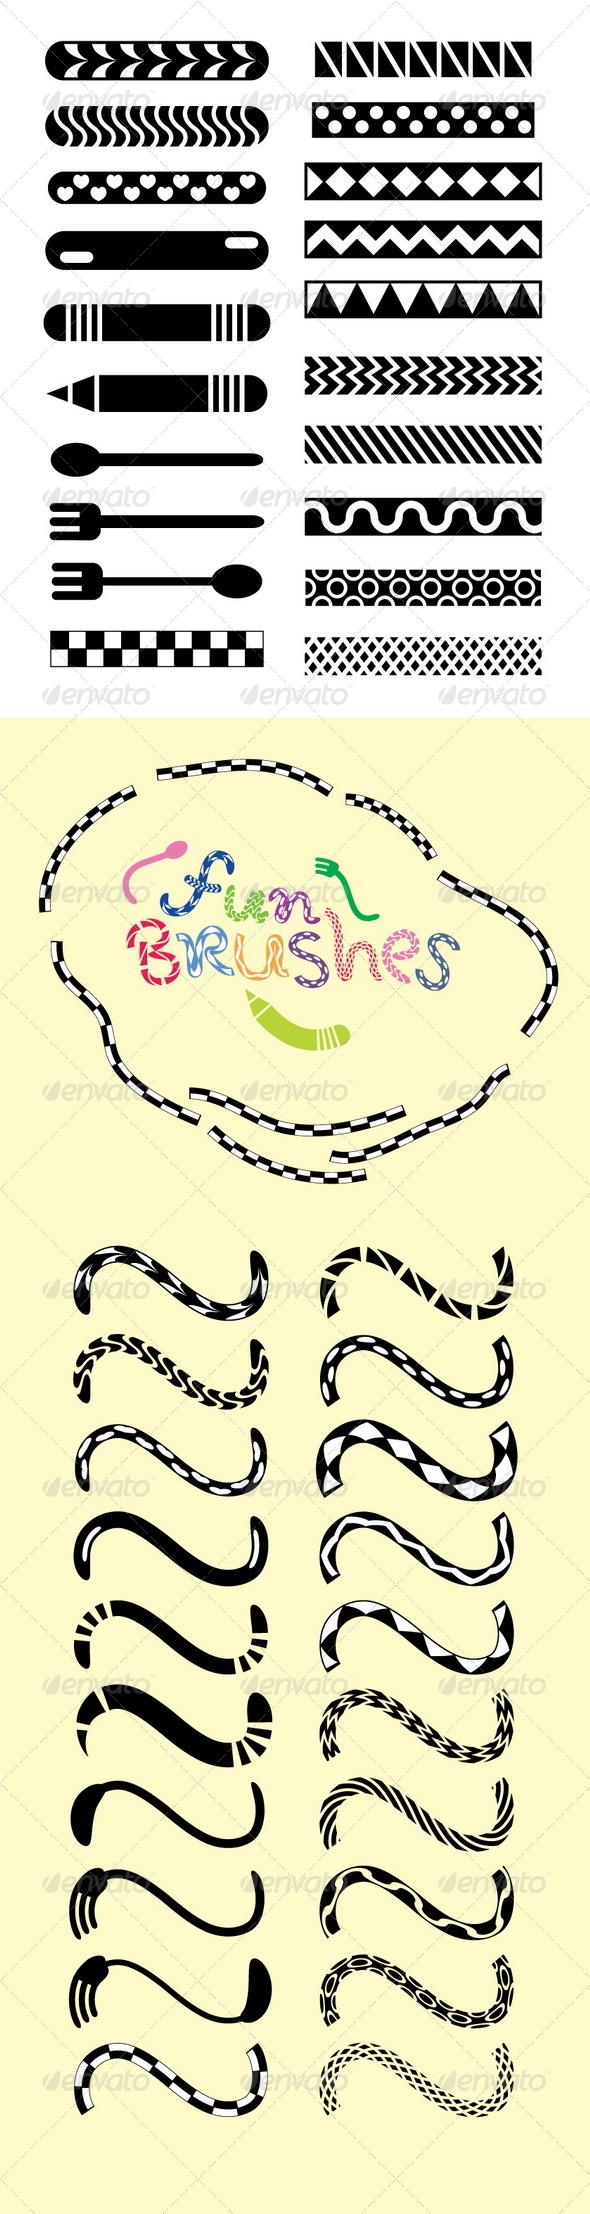 GraphicRiver Fun Brushes for Illustrator 4672843